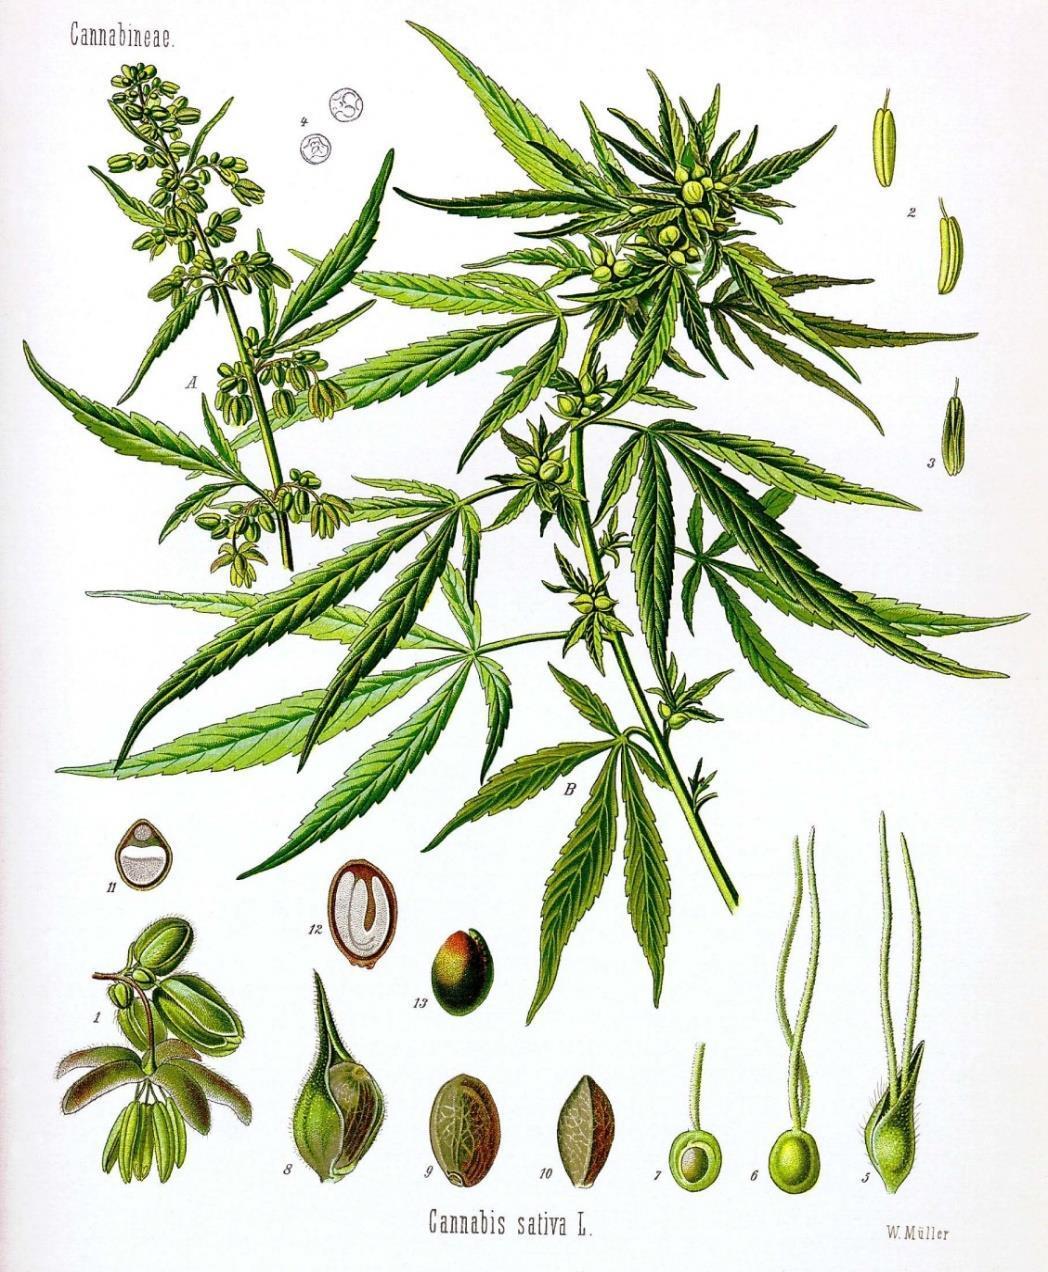 cannabis_sativa_katona_istvan_eloadas.jpg